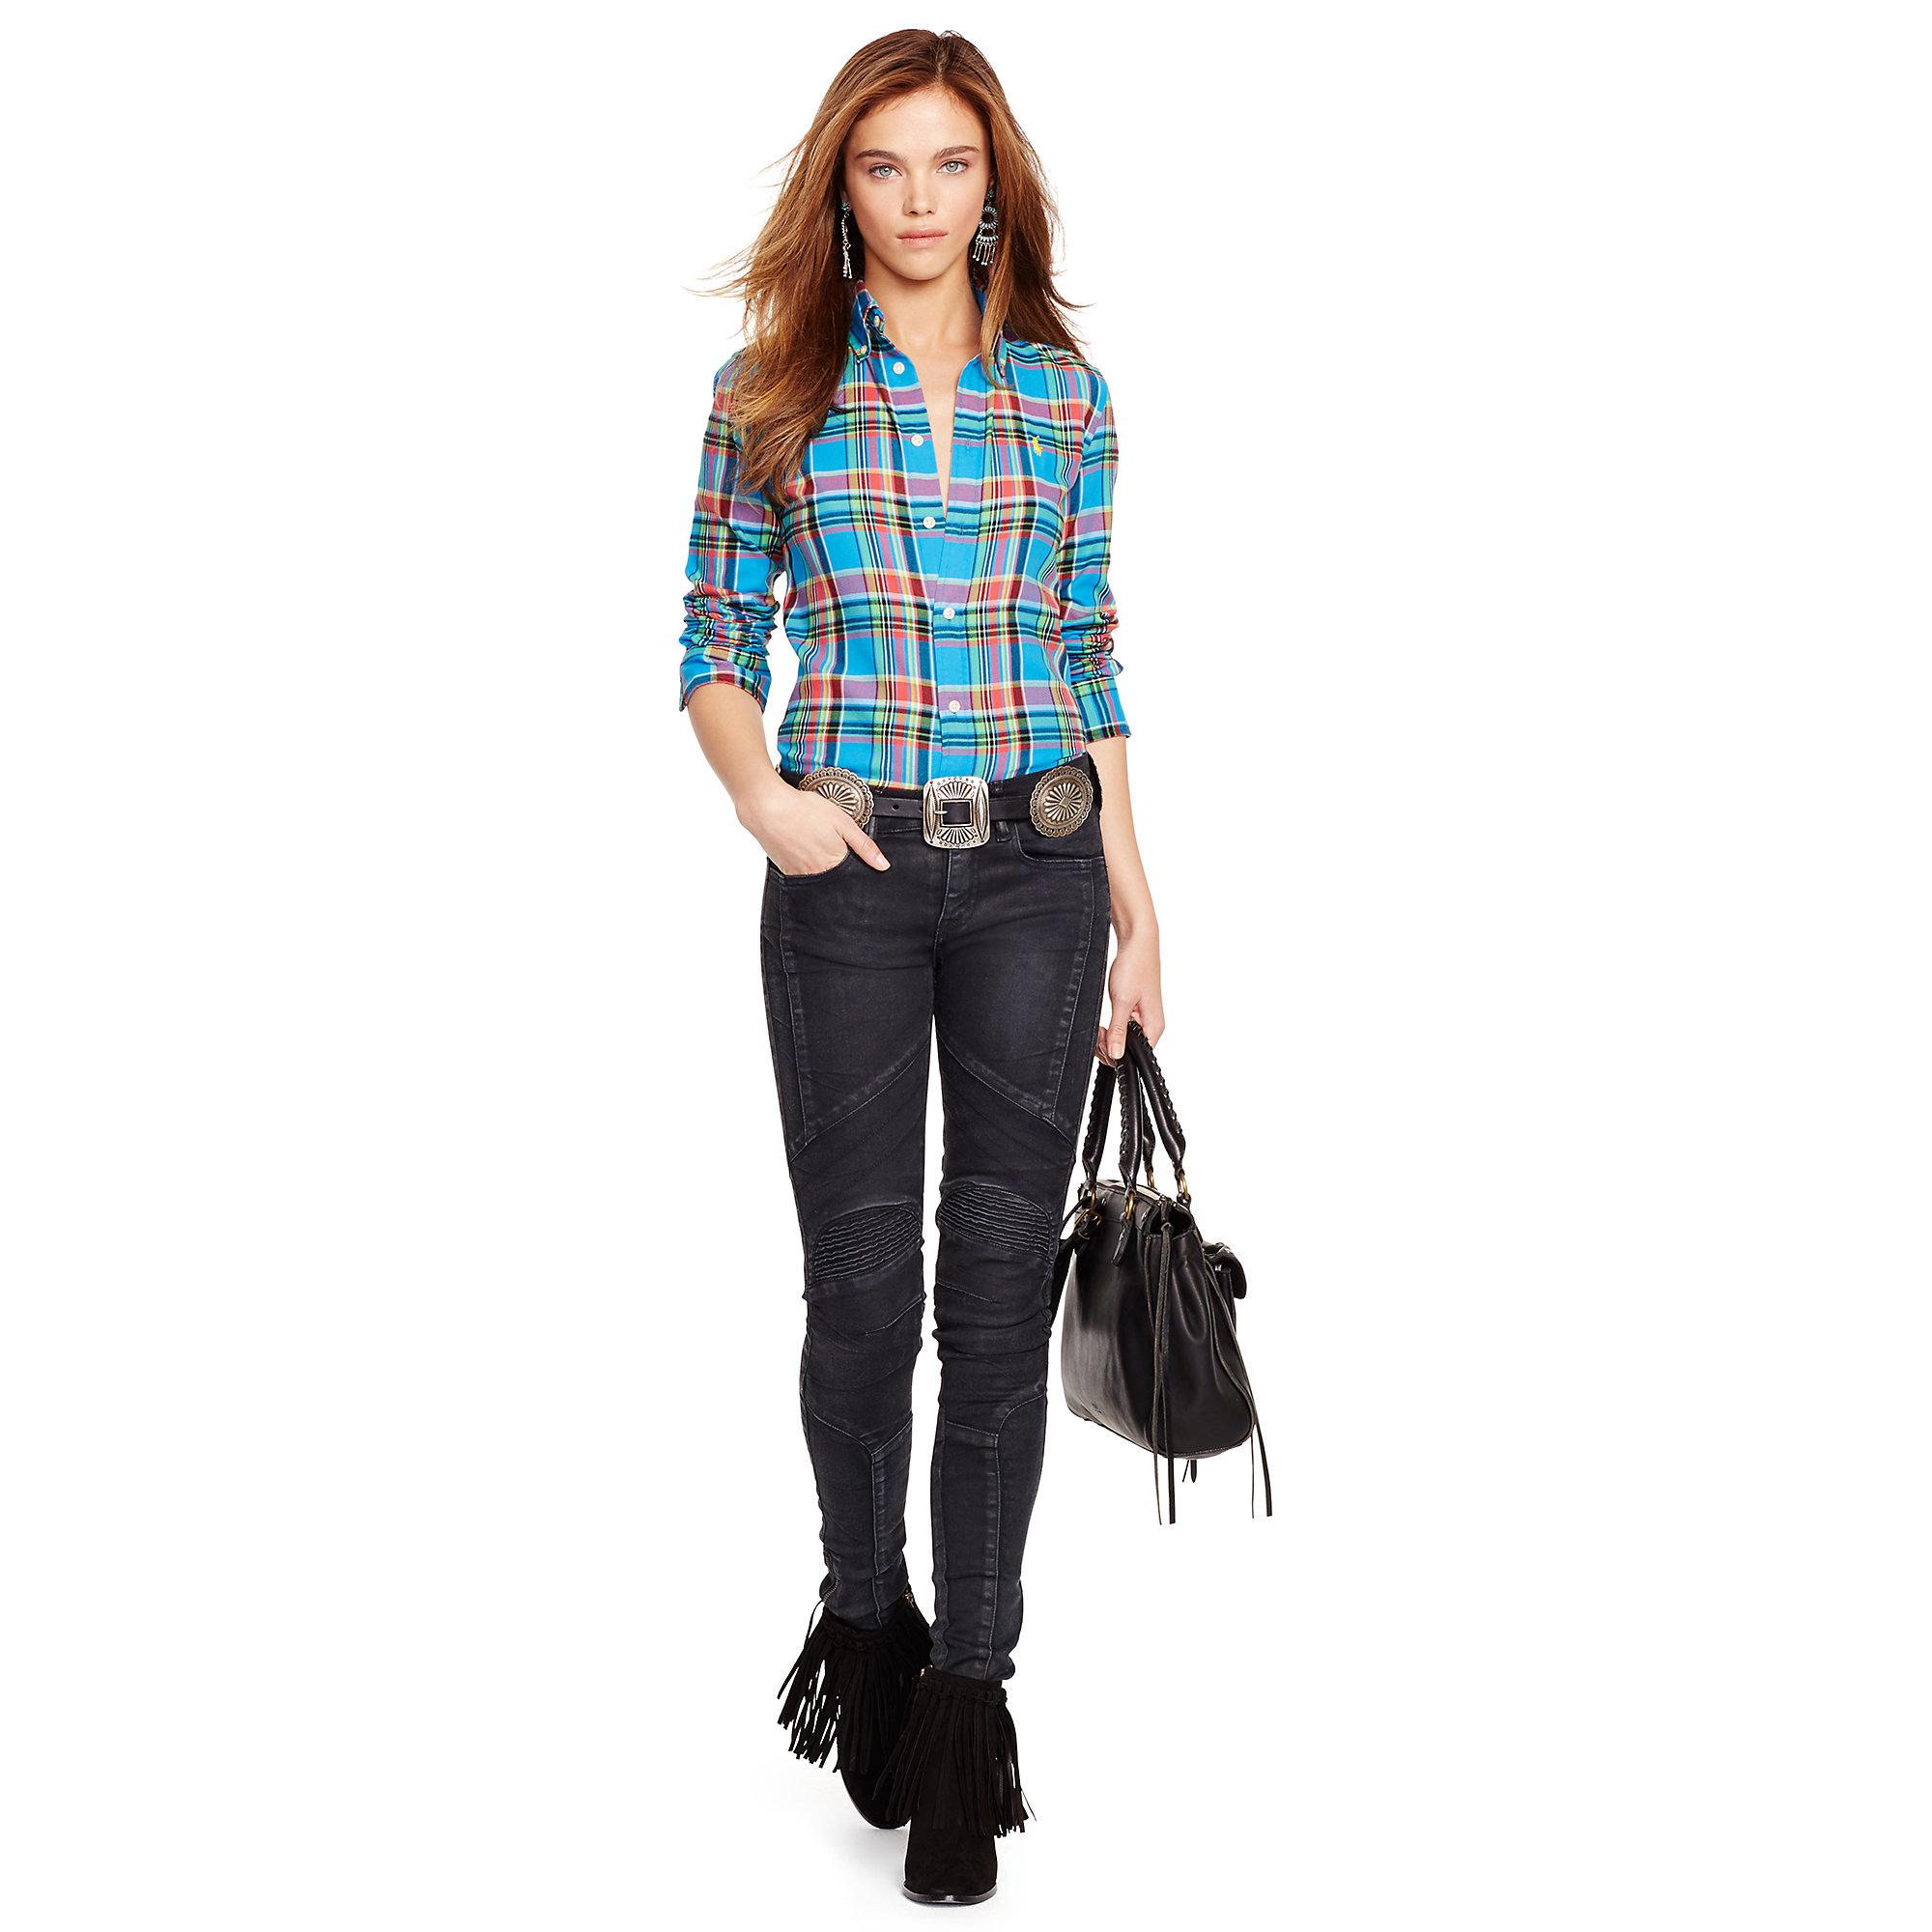 bc52af893186 Lyst - Polo Ralph Lauren Plaid Cotton Twill Shirt in Blue